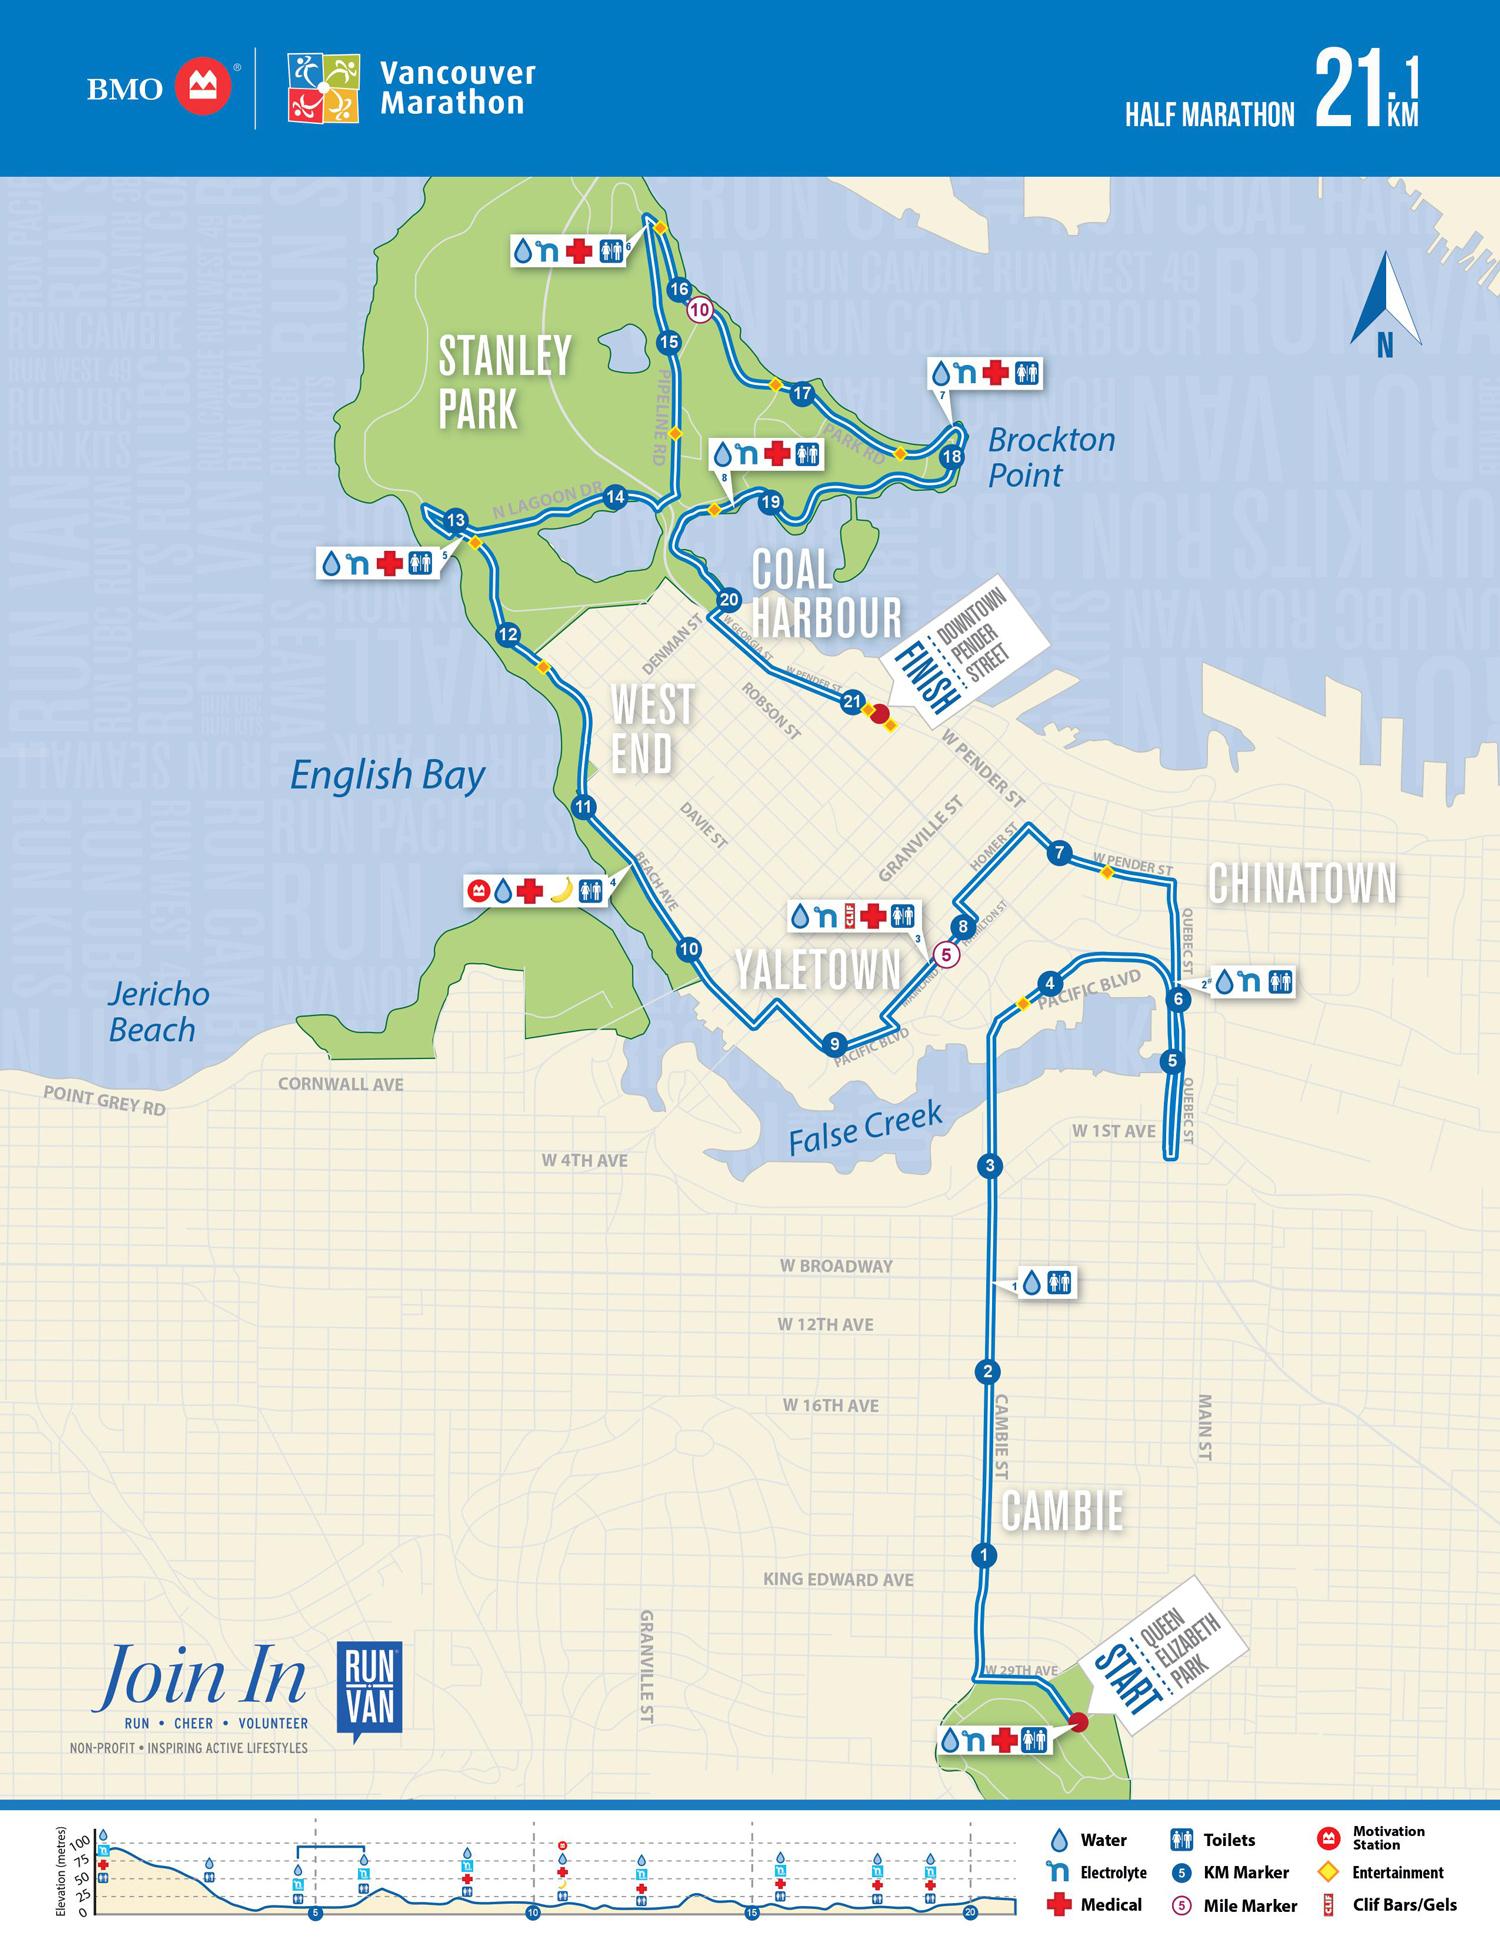 BMO Vancouver Half Marathon Course Map